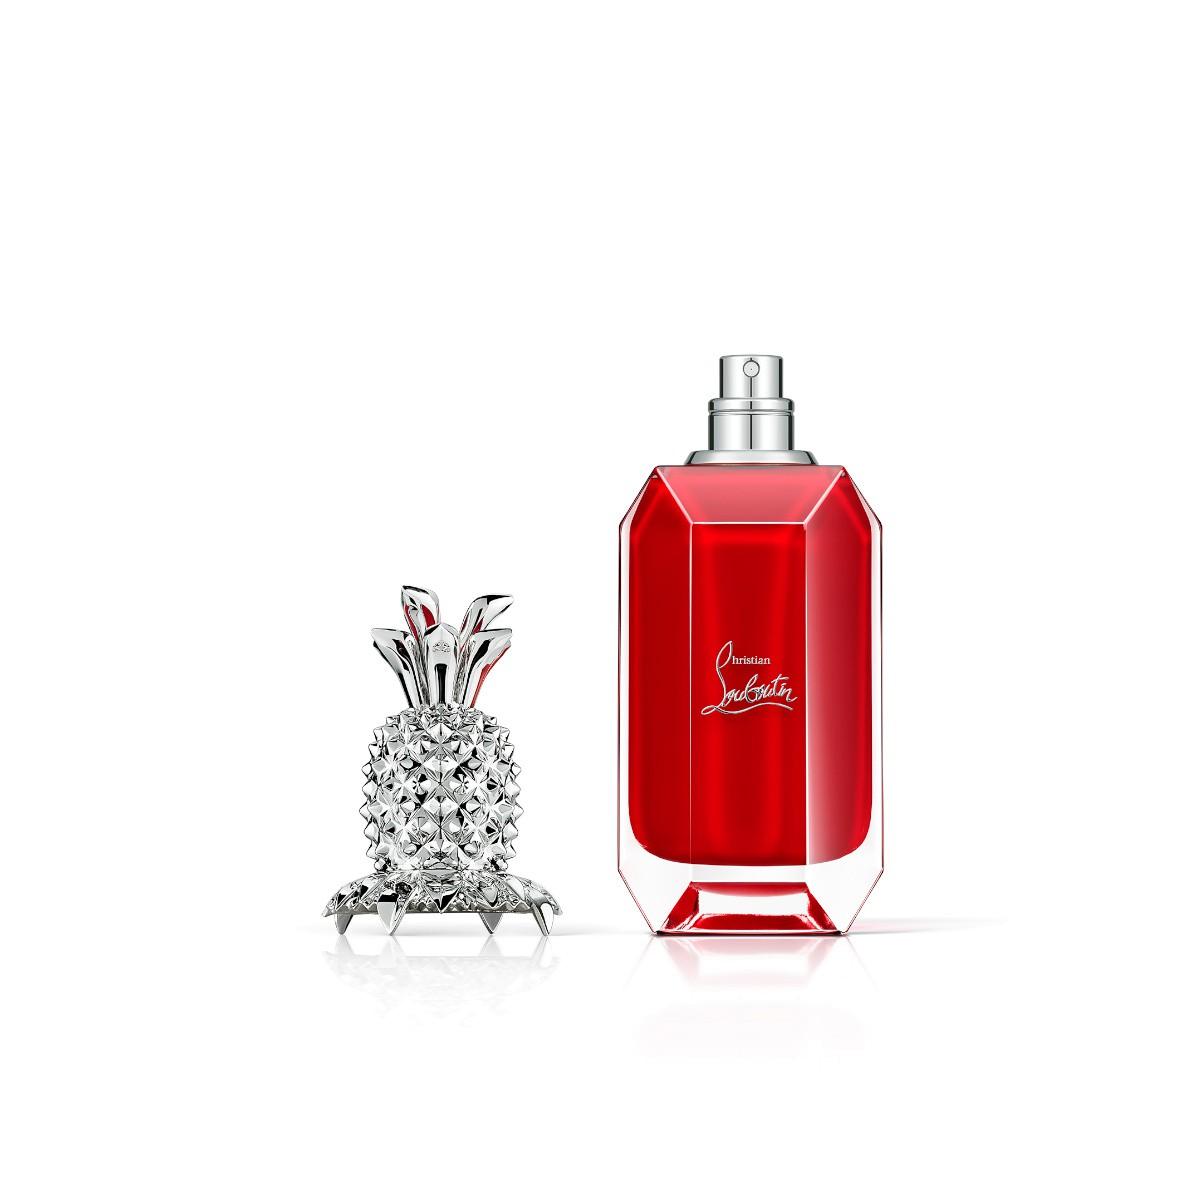 化妆品 - Loubifunk Eau De Parfum - Christian Louboutin